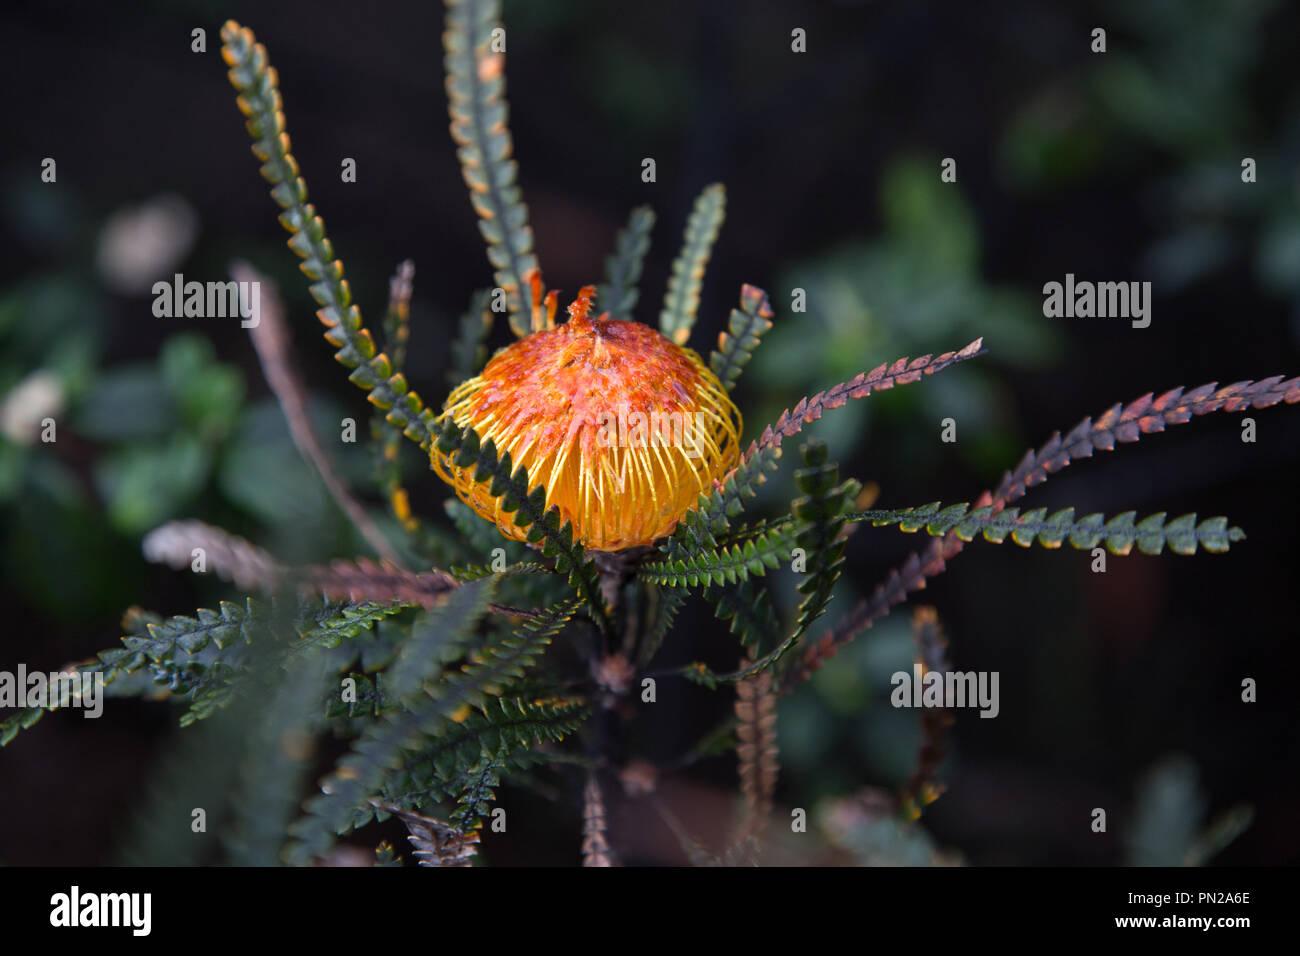 Showy Dryandra Western Australia - Stock Image